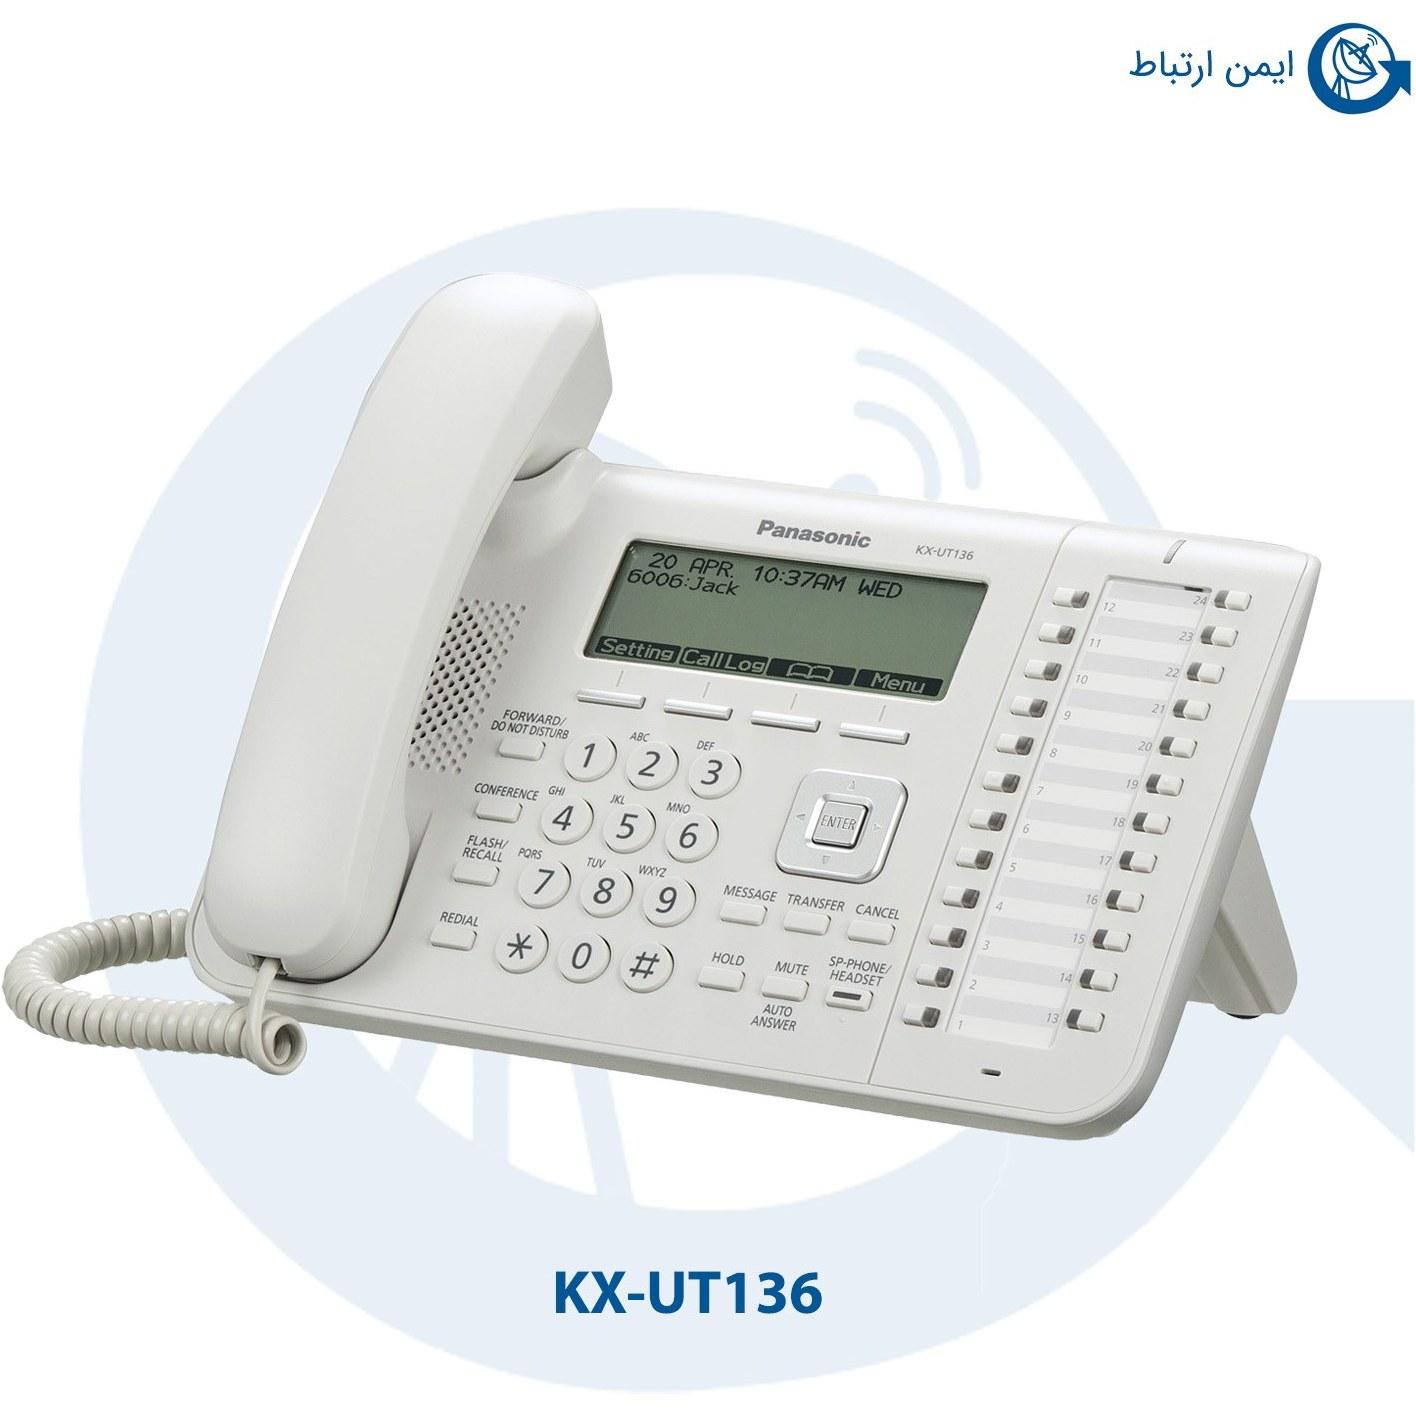 تصویر KX-UT136 تلفن تحت شبکه پاناسونیک